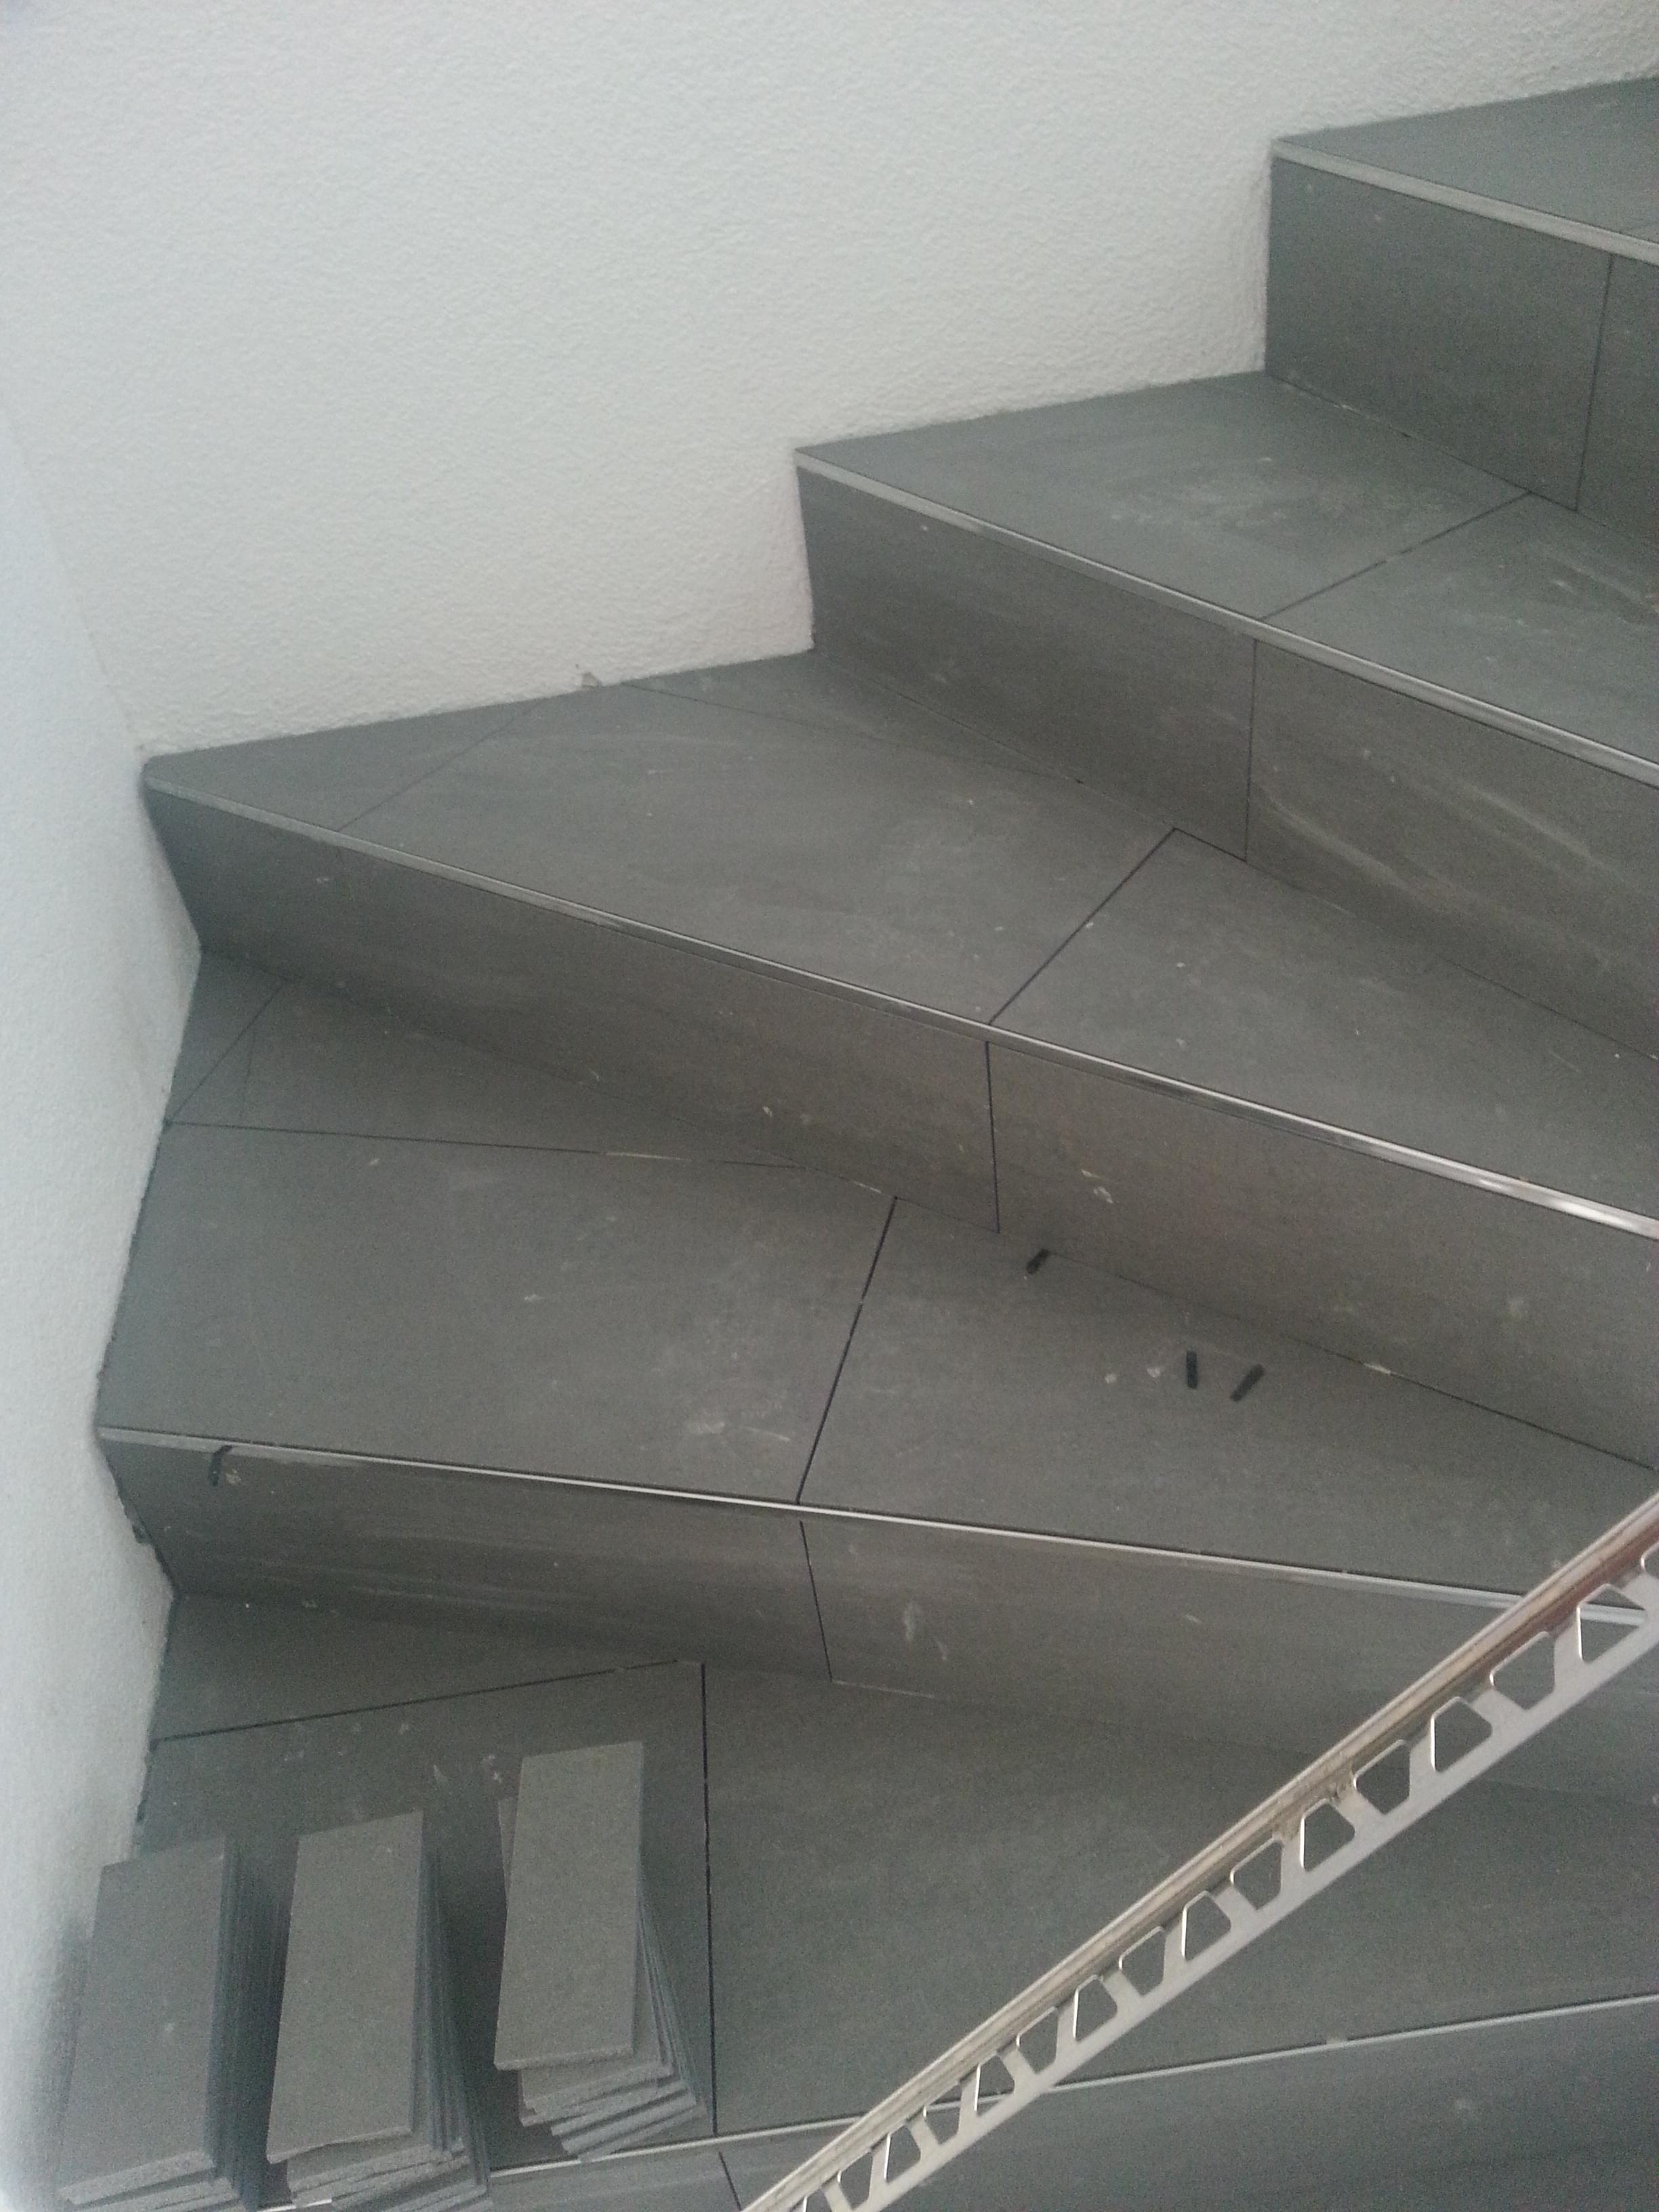 Fliesen Entfernt Wand Verputzen Fliesen Verputzen Hausdesigns Co